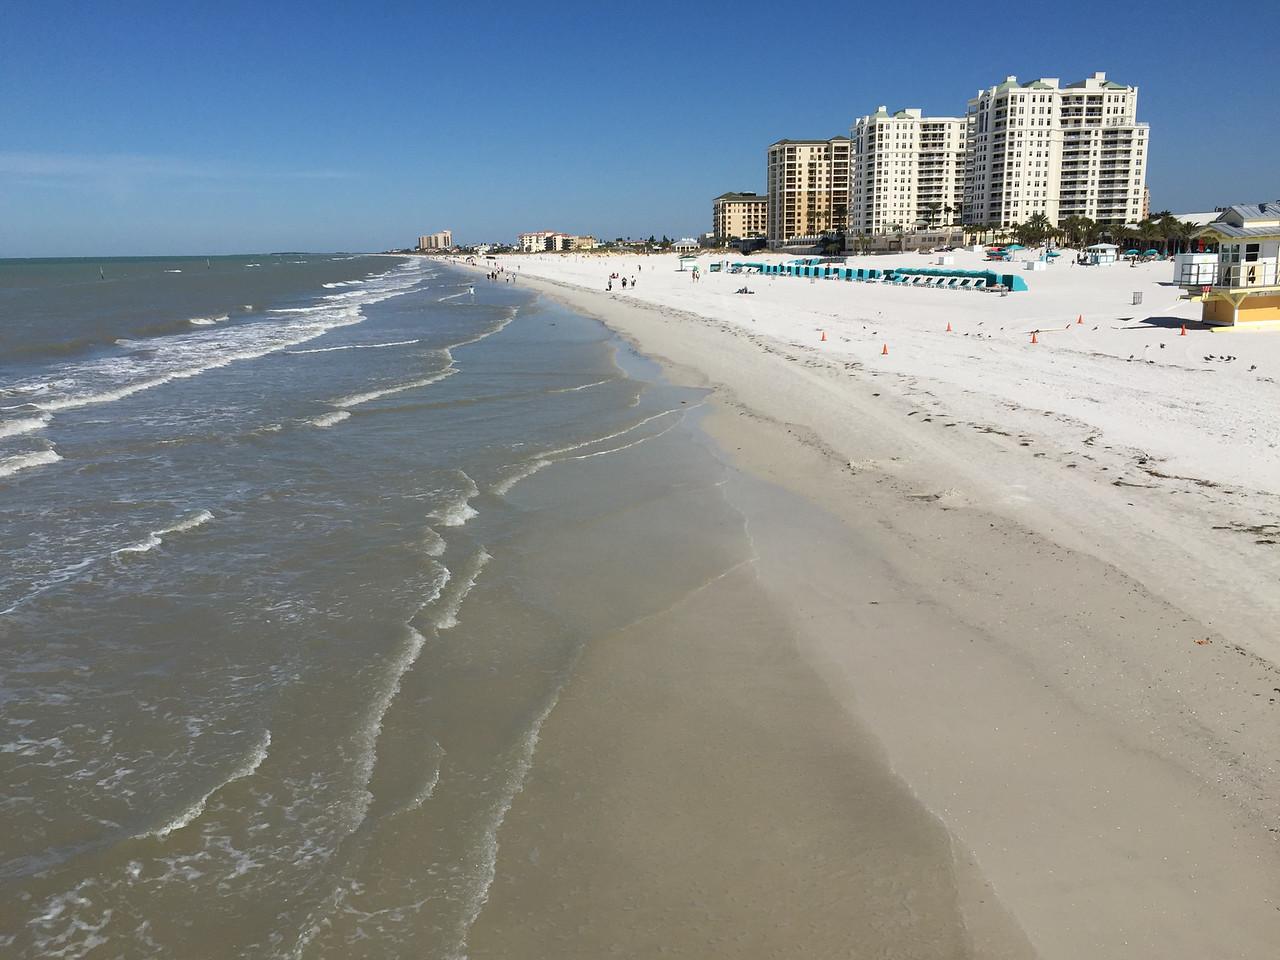 Clearwater  Beach, Florida - February 2015 (iPhone image)